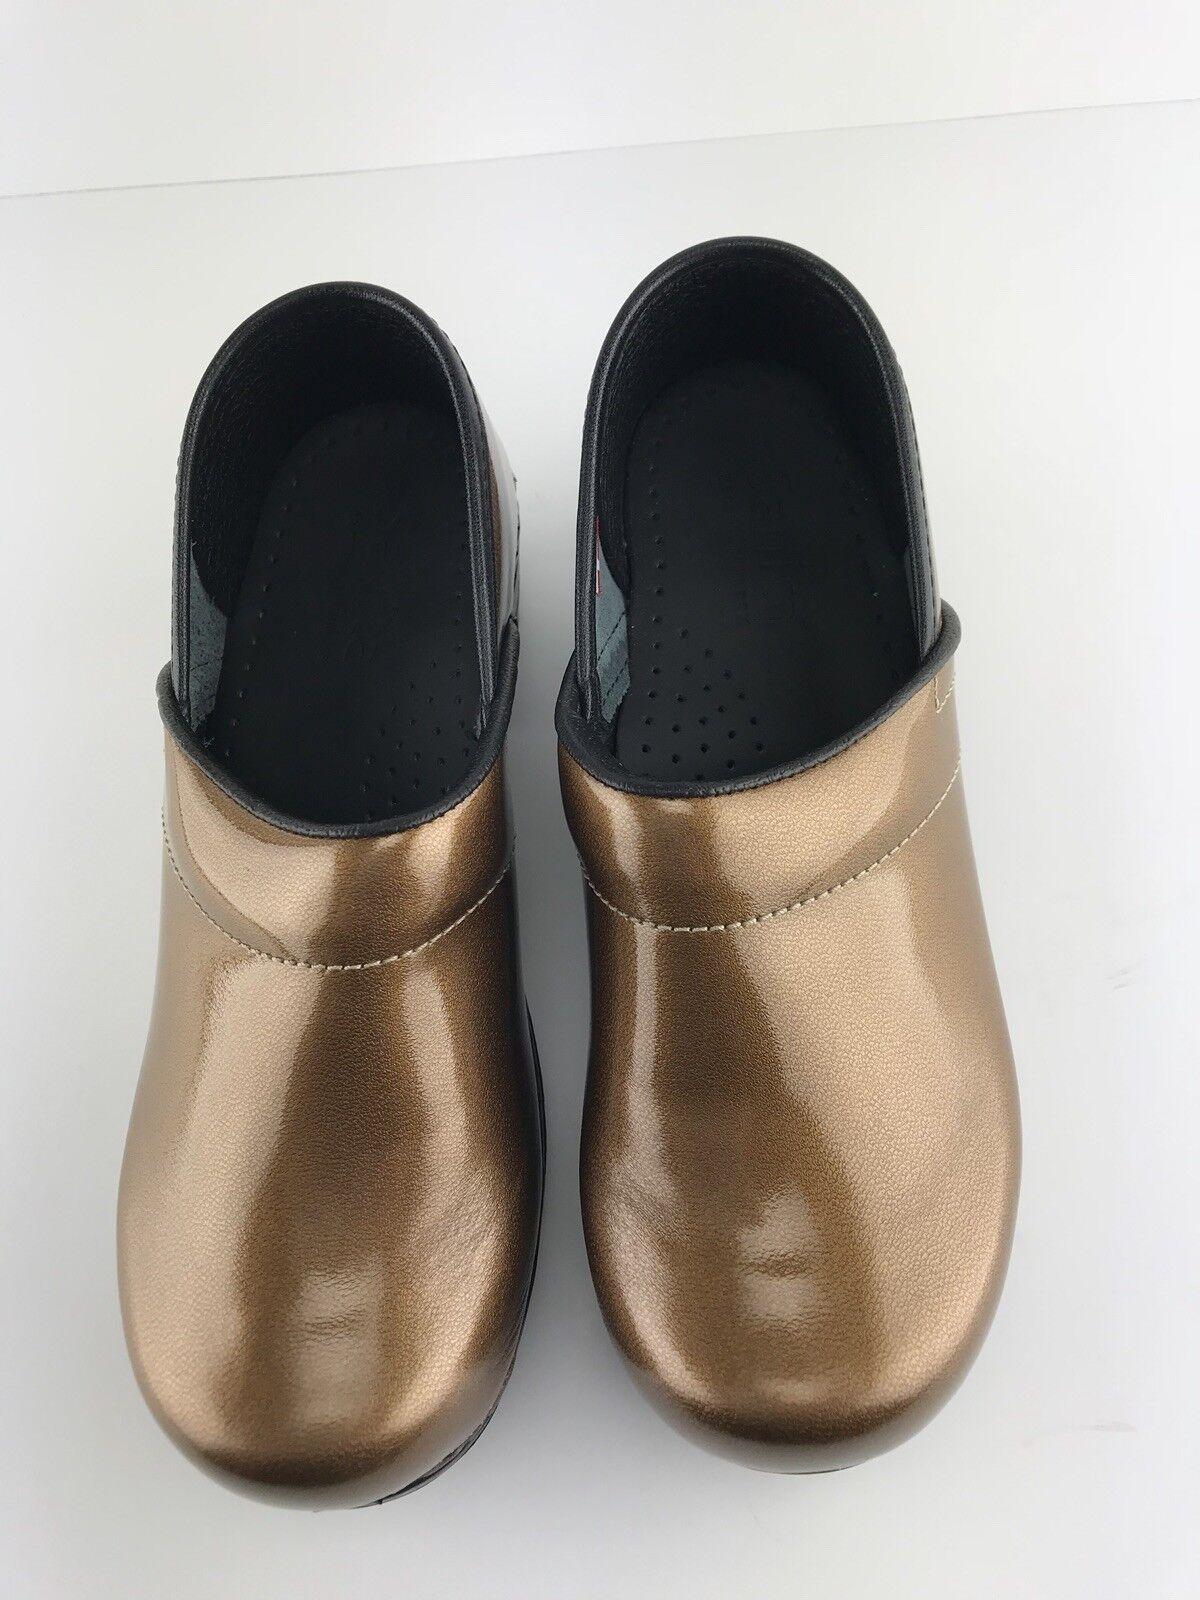 New New New Womens Sanita Professional gold Metallic Clogs Size 6 36 2c2199